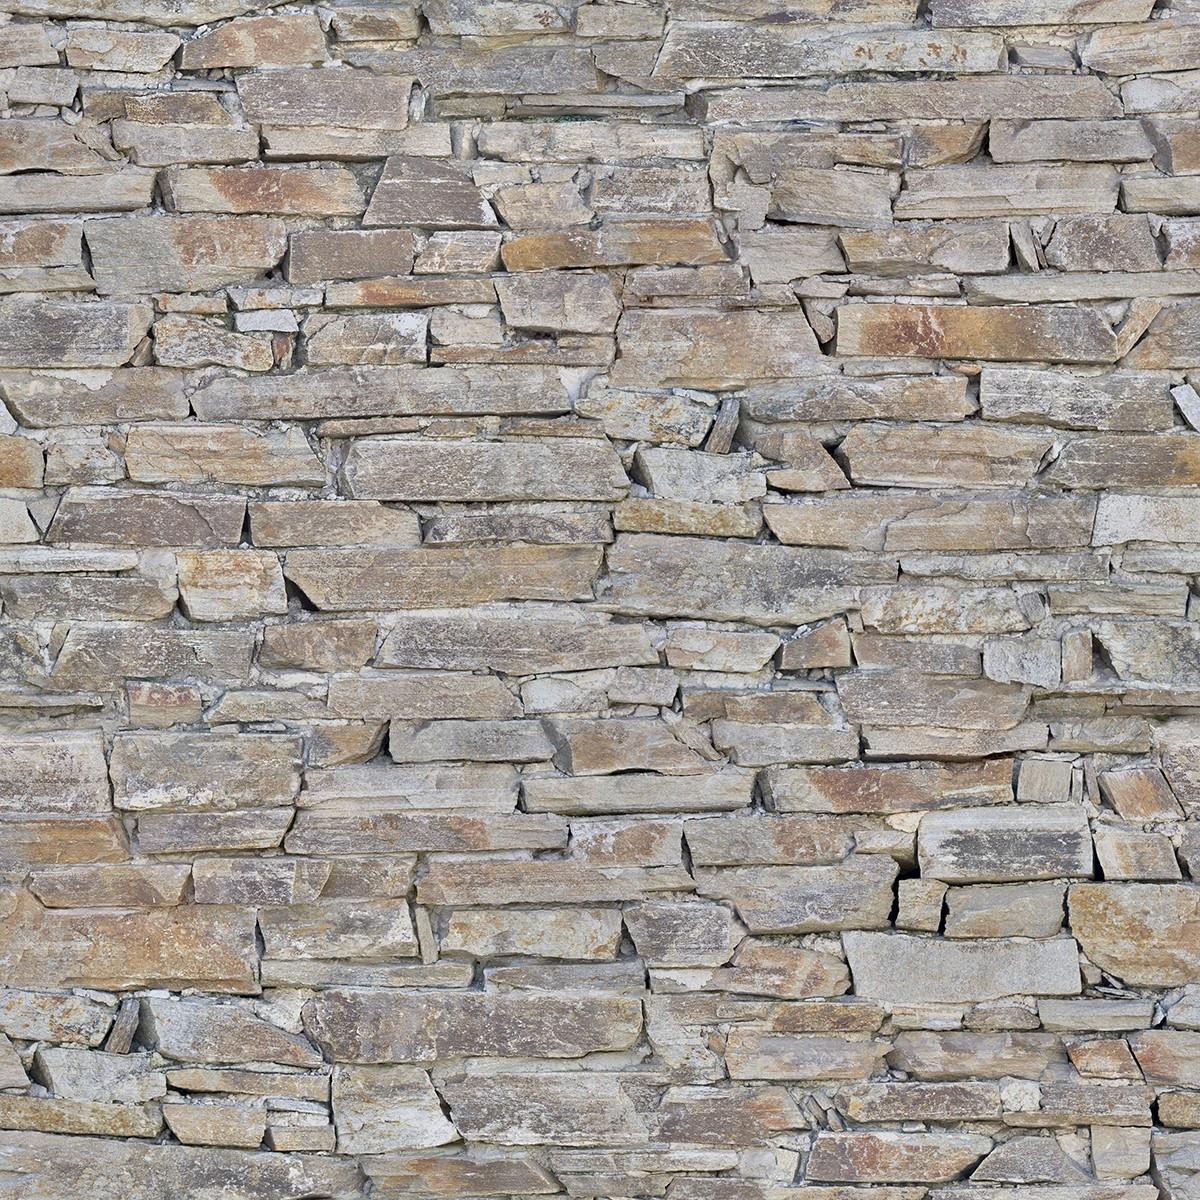 Architecture Stone Texture Brick Wall, Stone Texture, Stone.